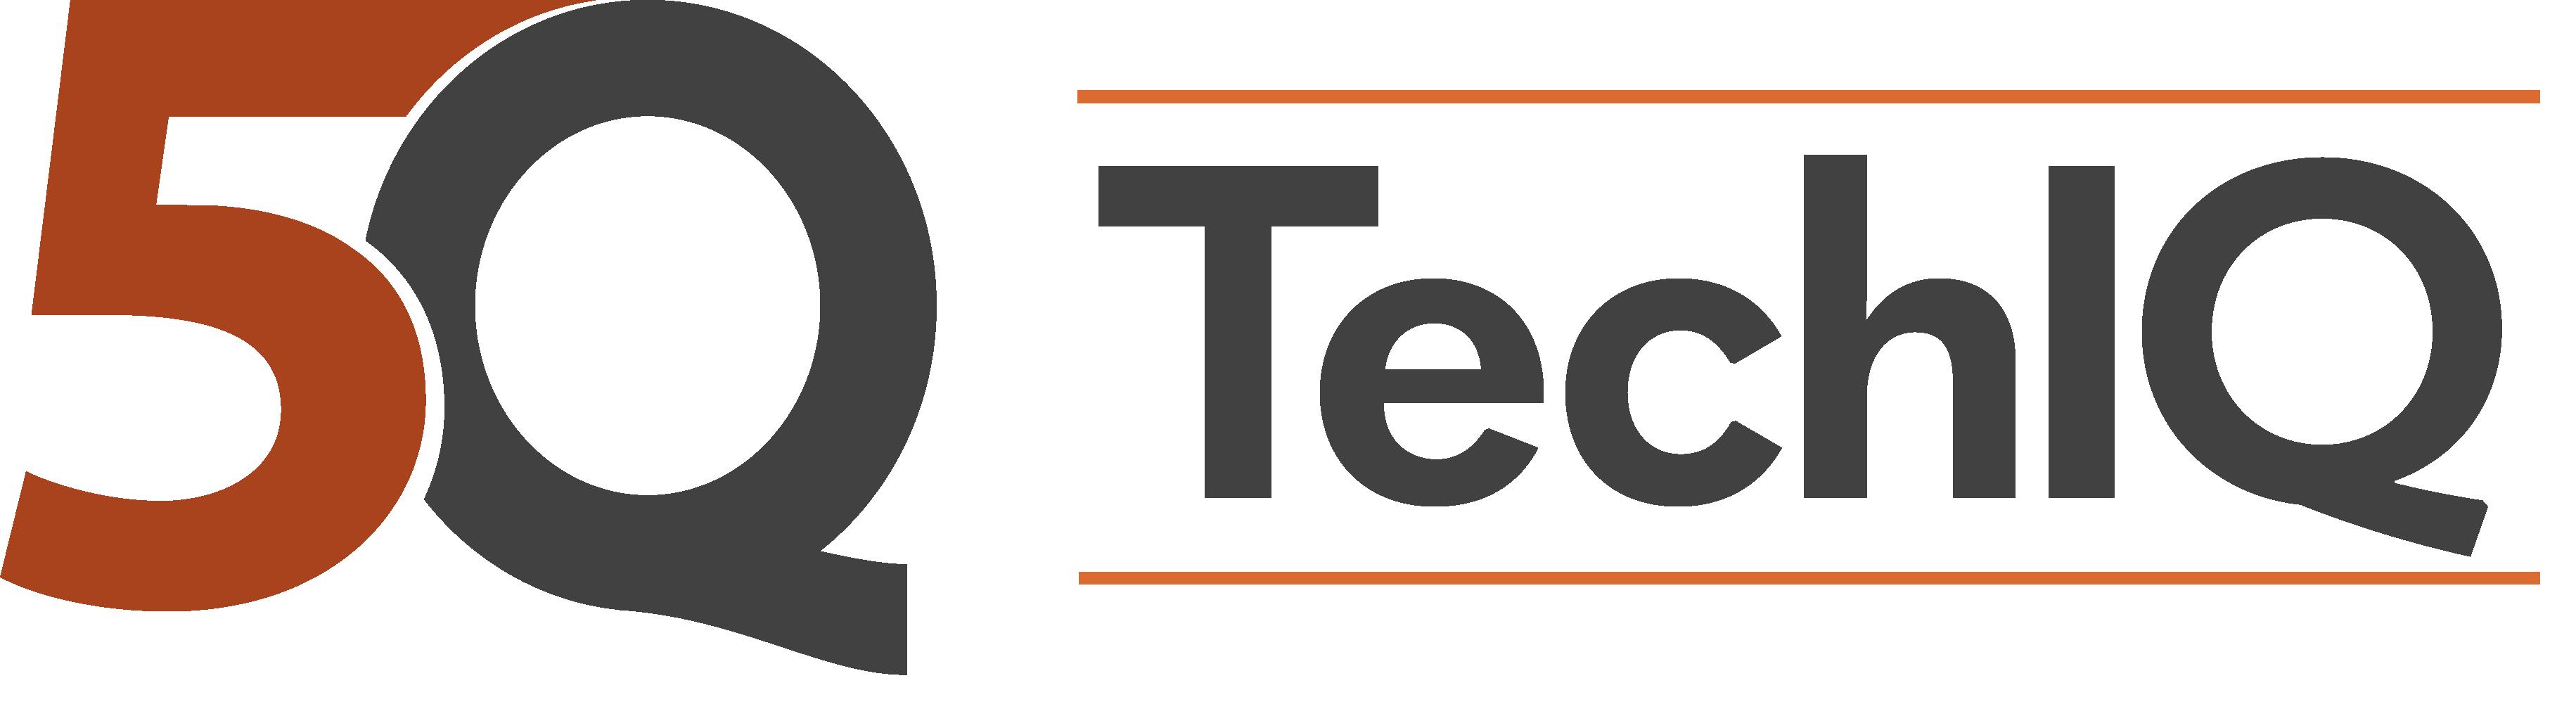 5Q_TechIQ_Logos-FullColor copy